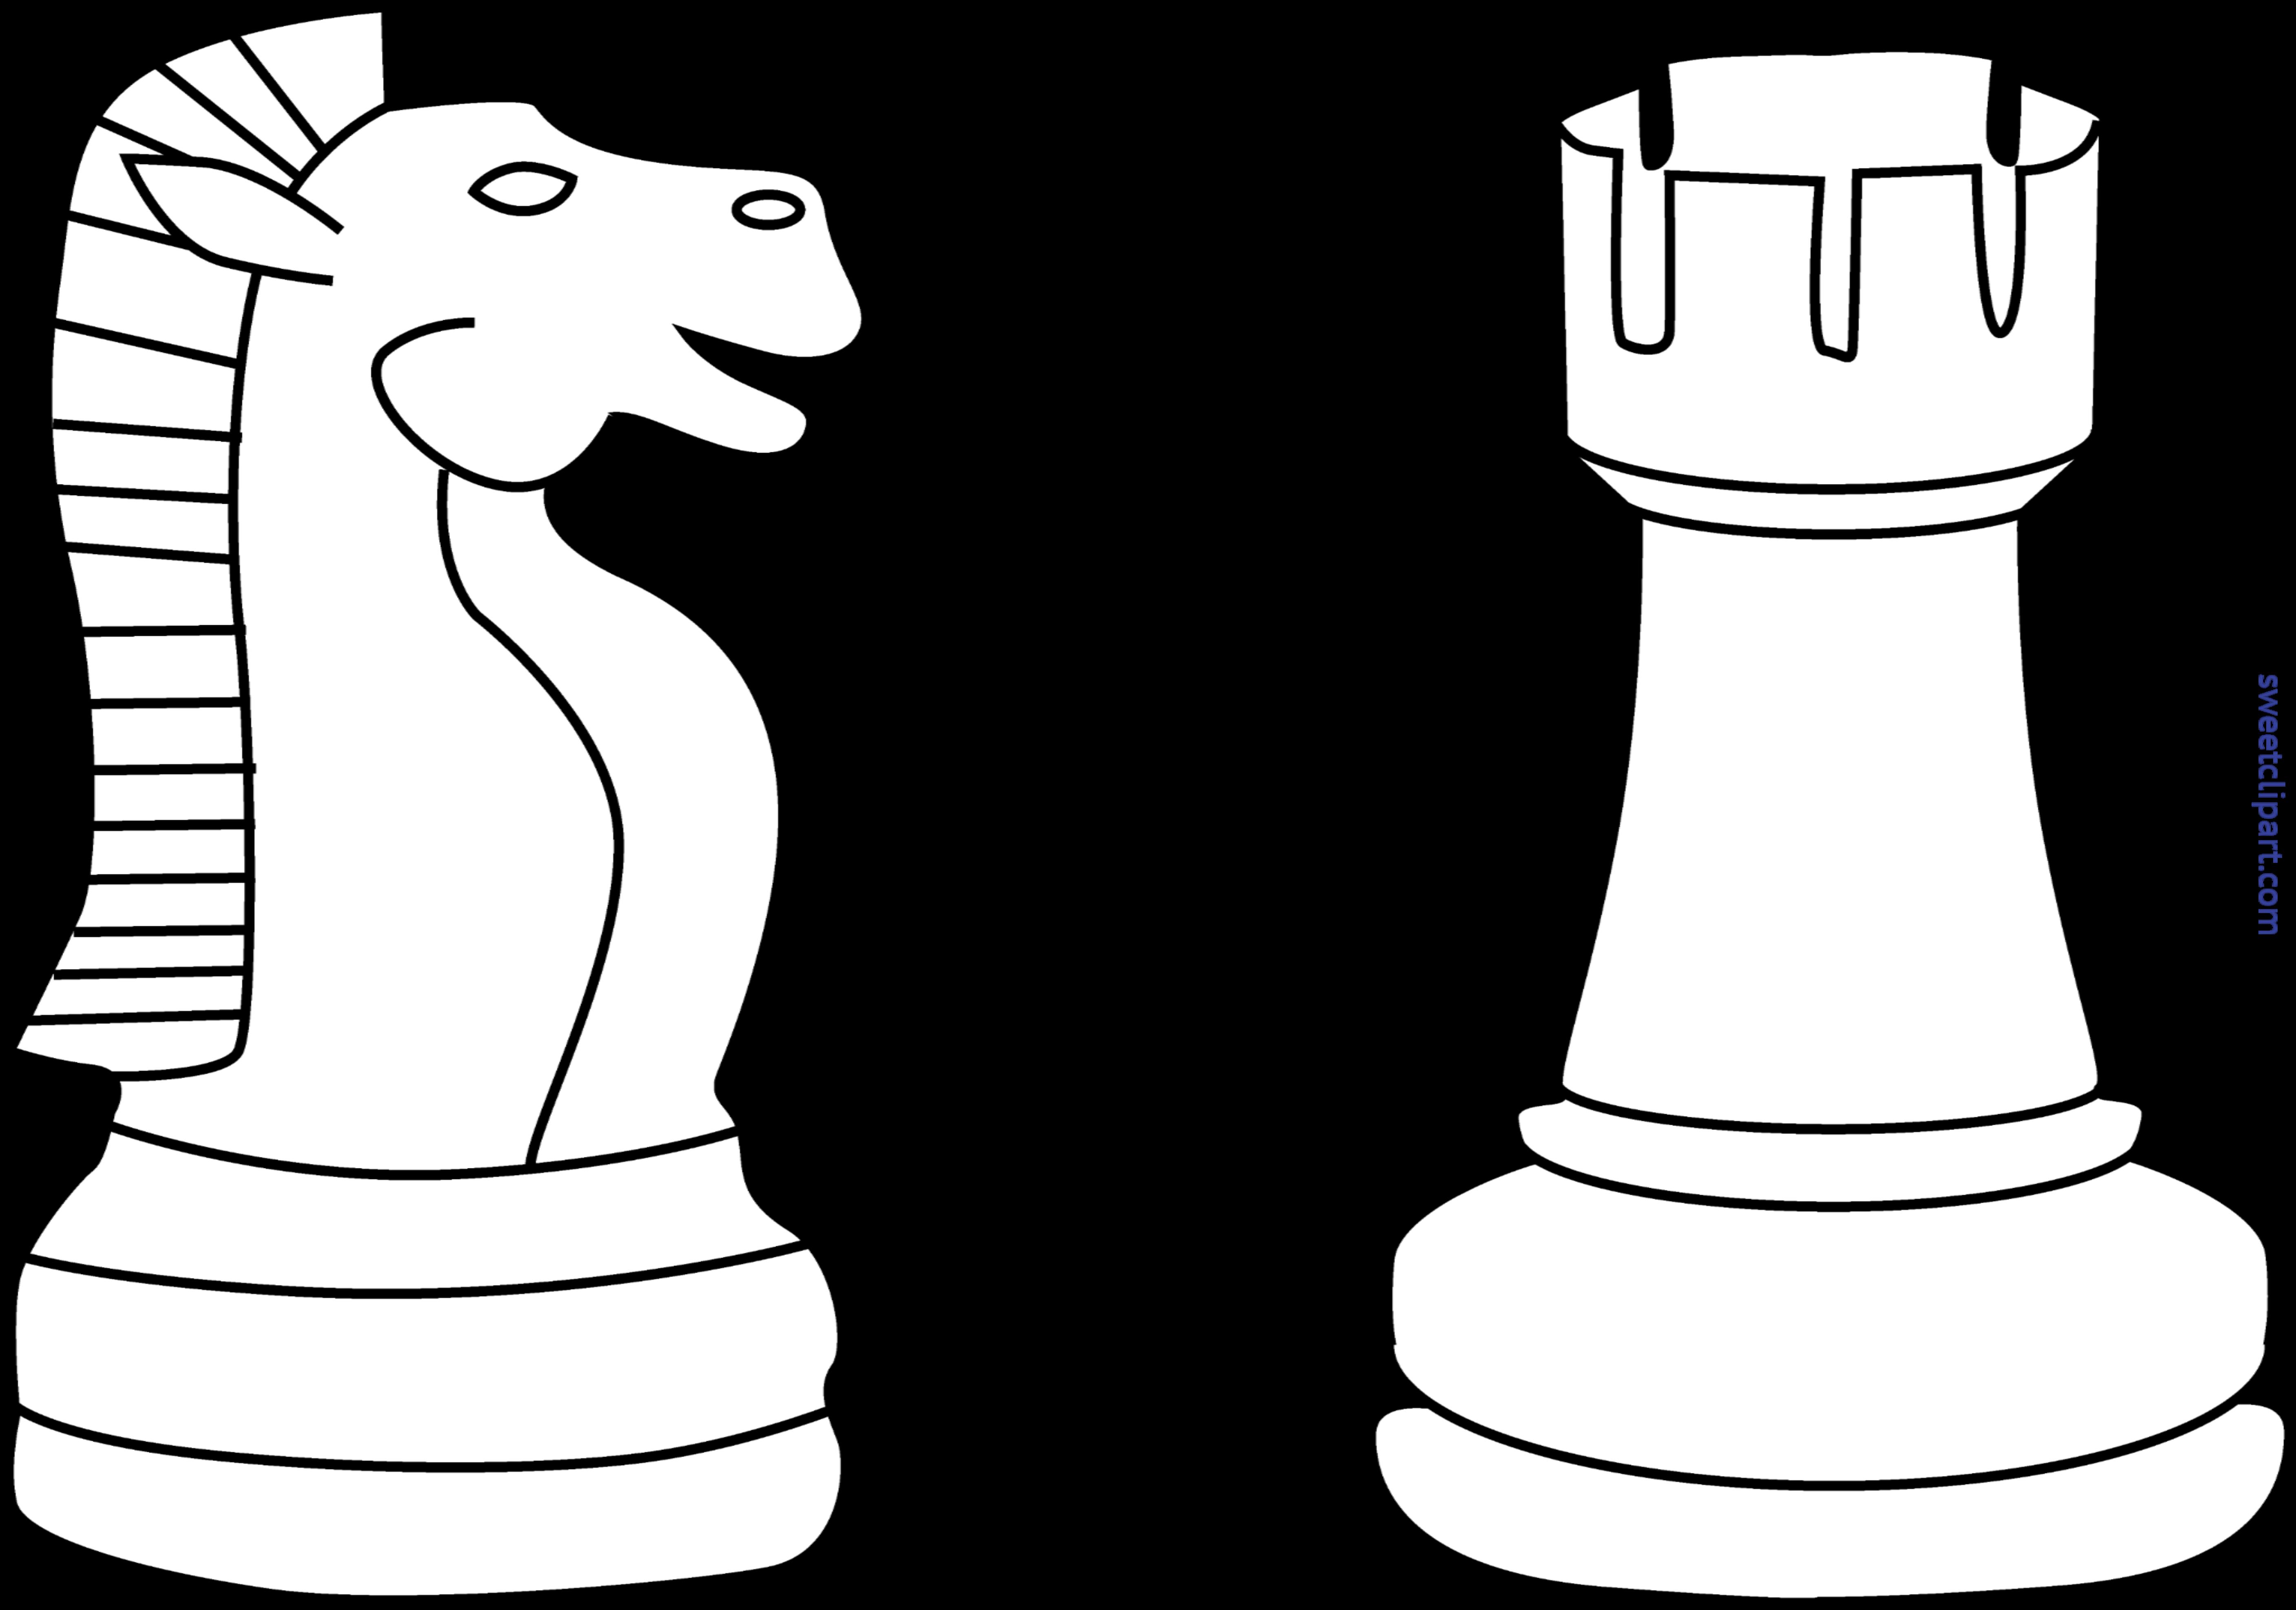 Pieces lineart clip art. Chess clipart indoor sport